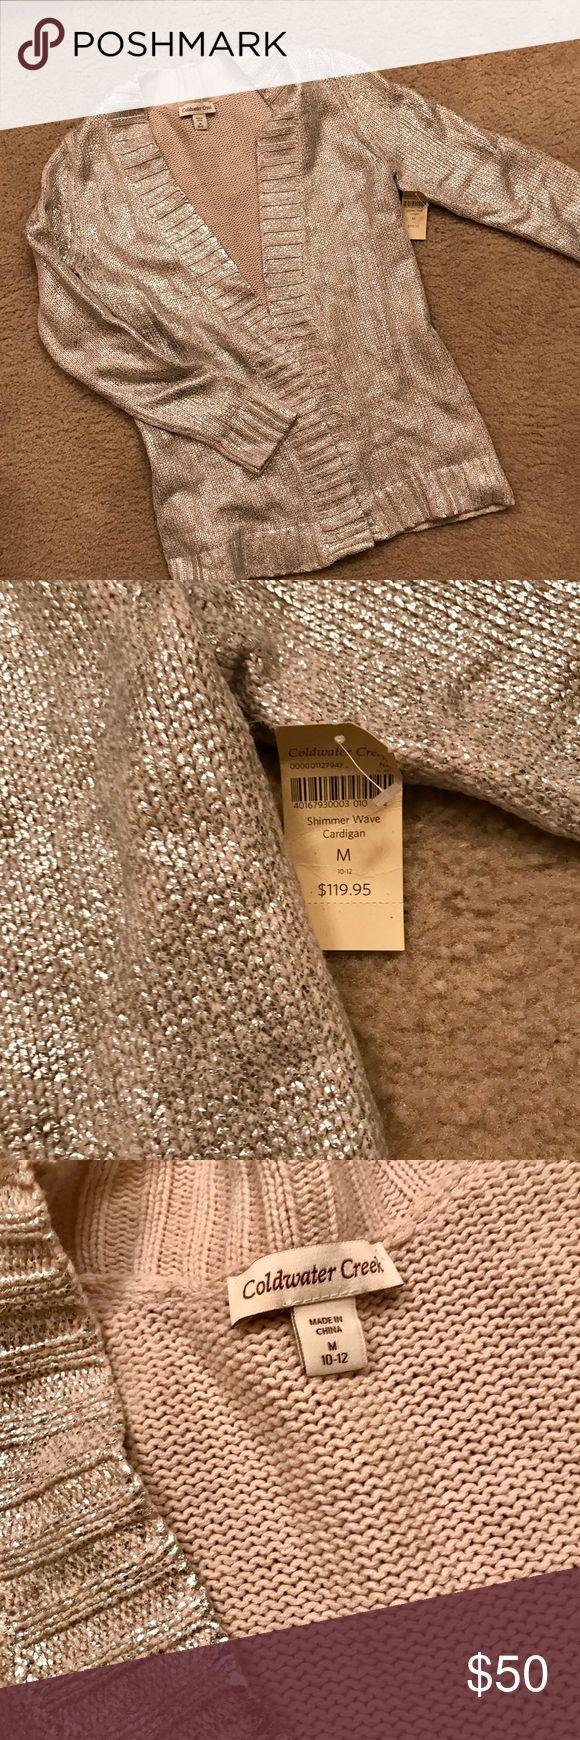 Cold Water Creek Cardigan. NWT Beautiful mid weight metallic cardigan. Never worn. Size 10-12 Coldwater Creek Sweaters Cardigans